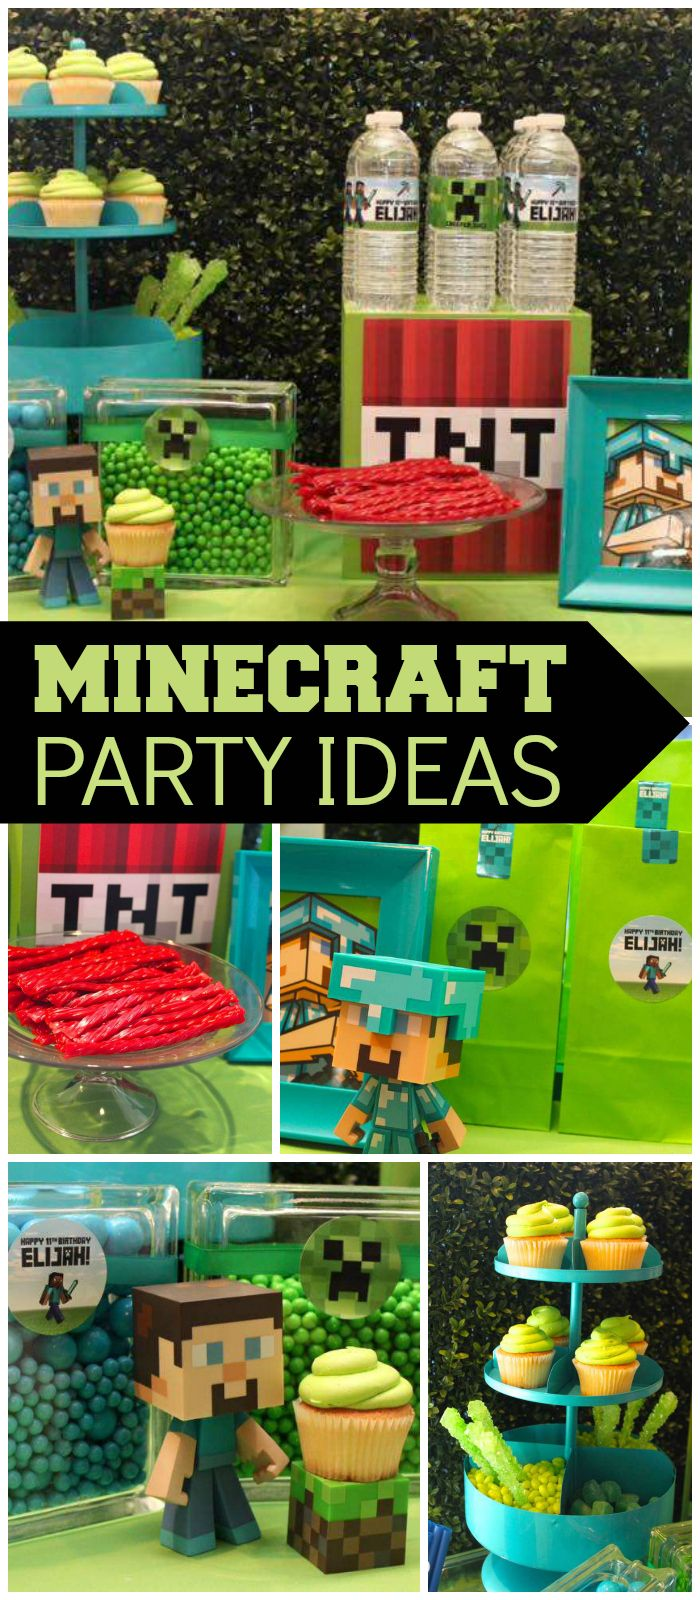 Mine craft birthday ideas - Minecraft Birthday Elijah S Adventure